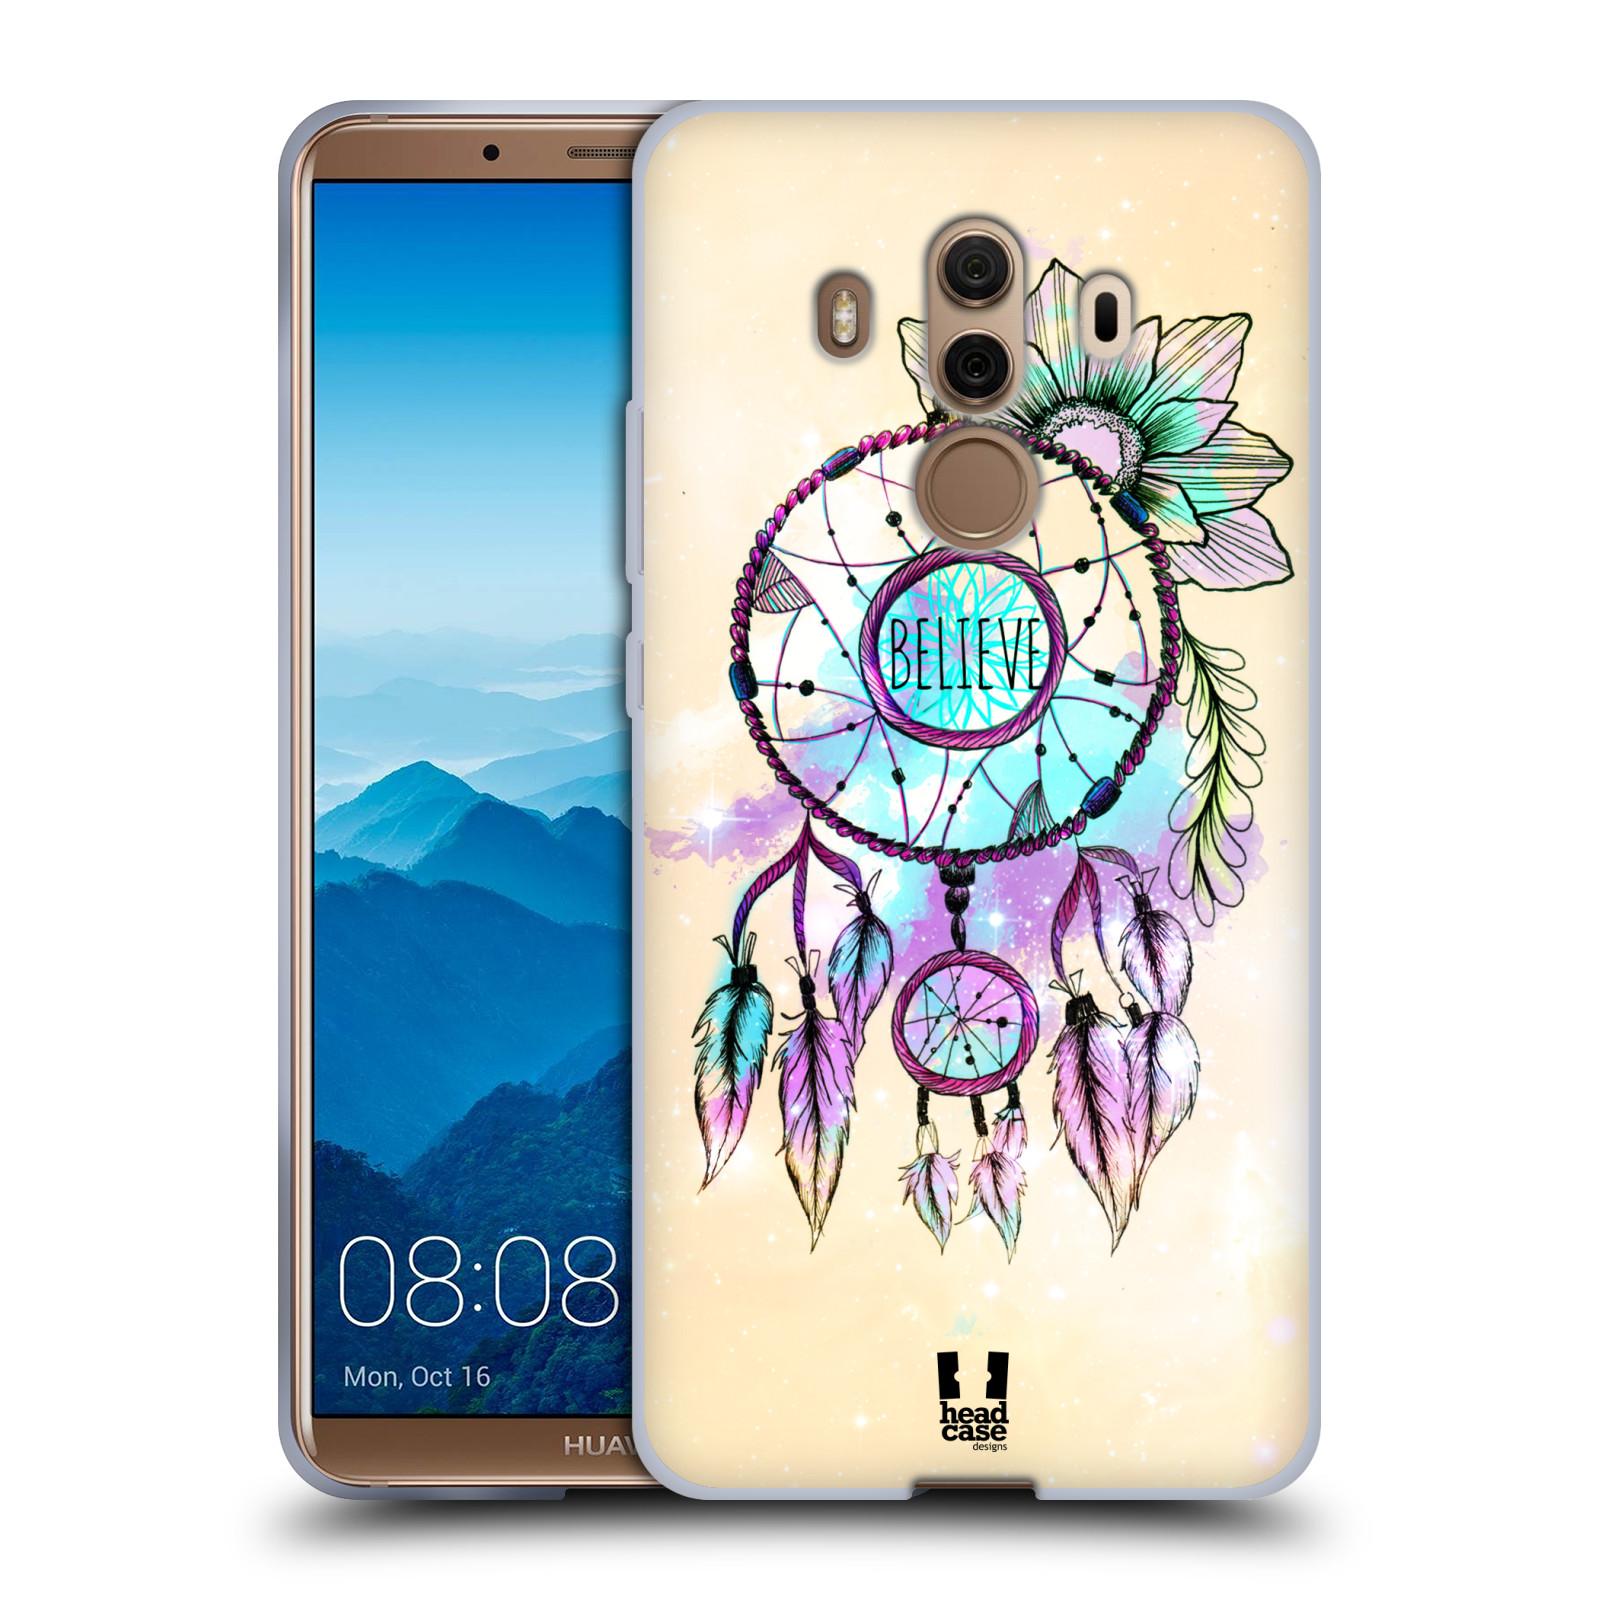 Silikonové pouzdro na mobil Huawei Mate 10 Pro - Head Case - MIX BELIEVE